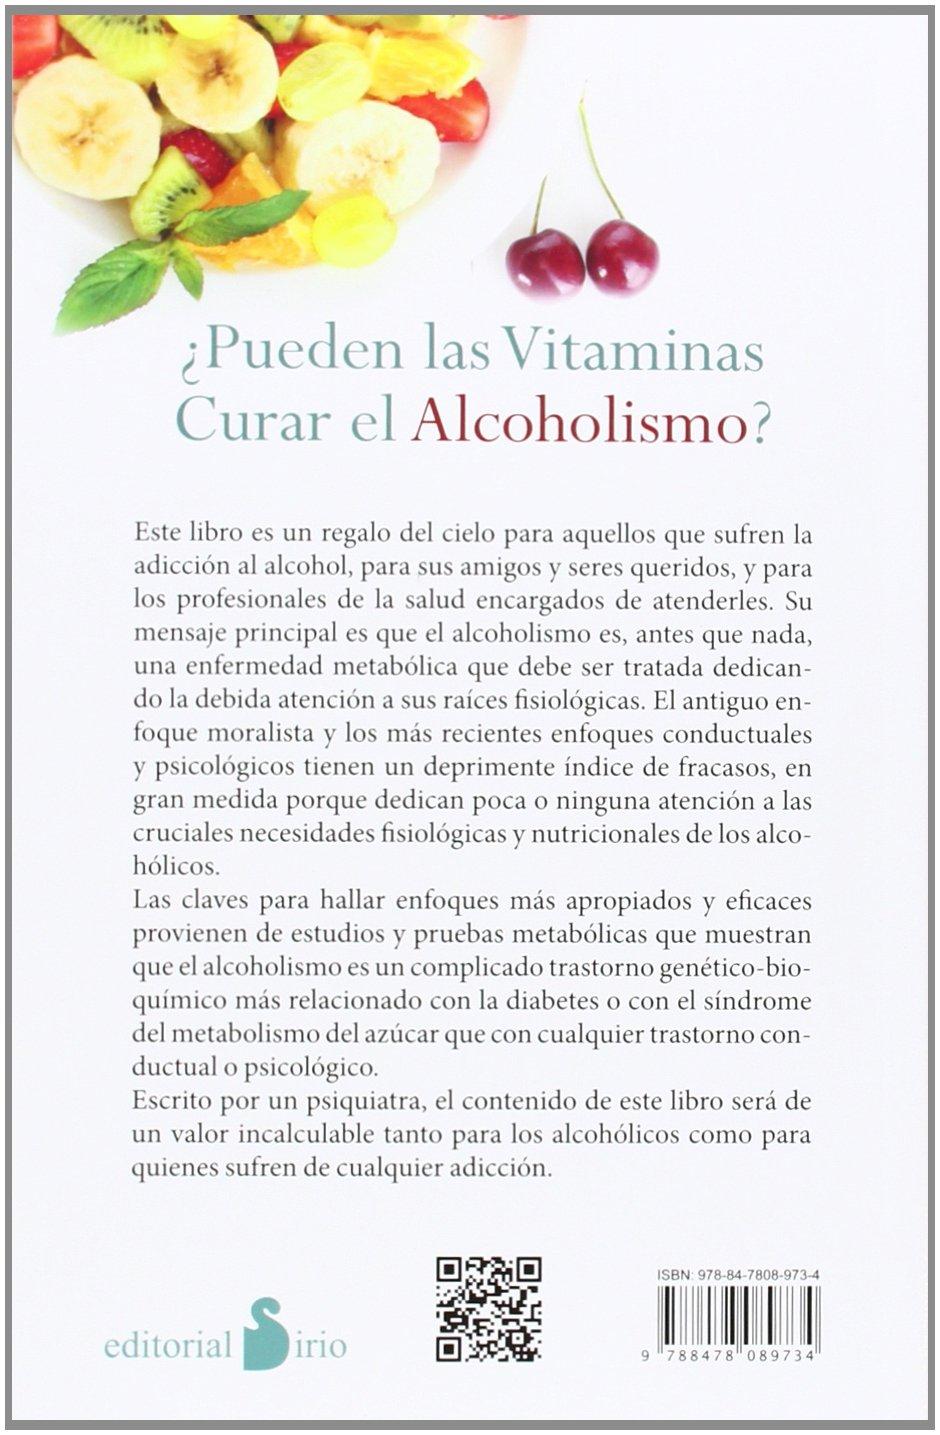 Pueden las vitaminas curar el alcoholismo? (Spanish Edition): Abram Hoffer, Andrew Saul: 9788478089734: Amazon.com: Books